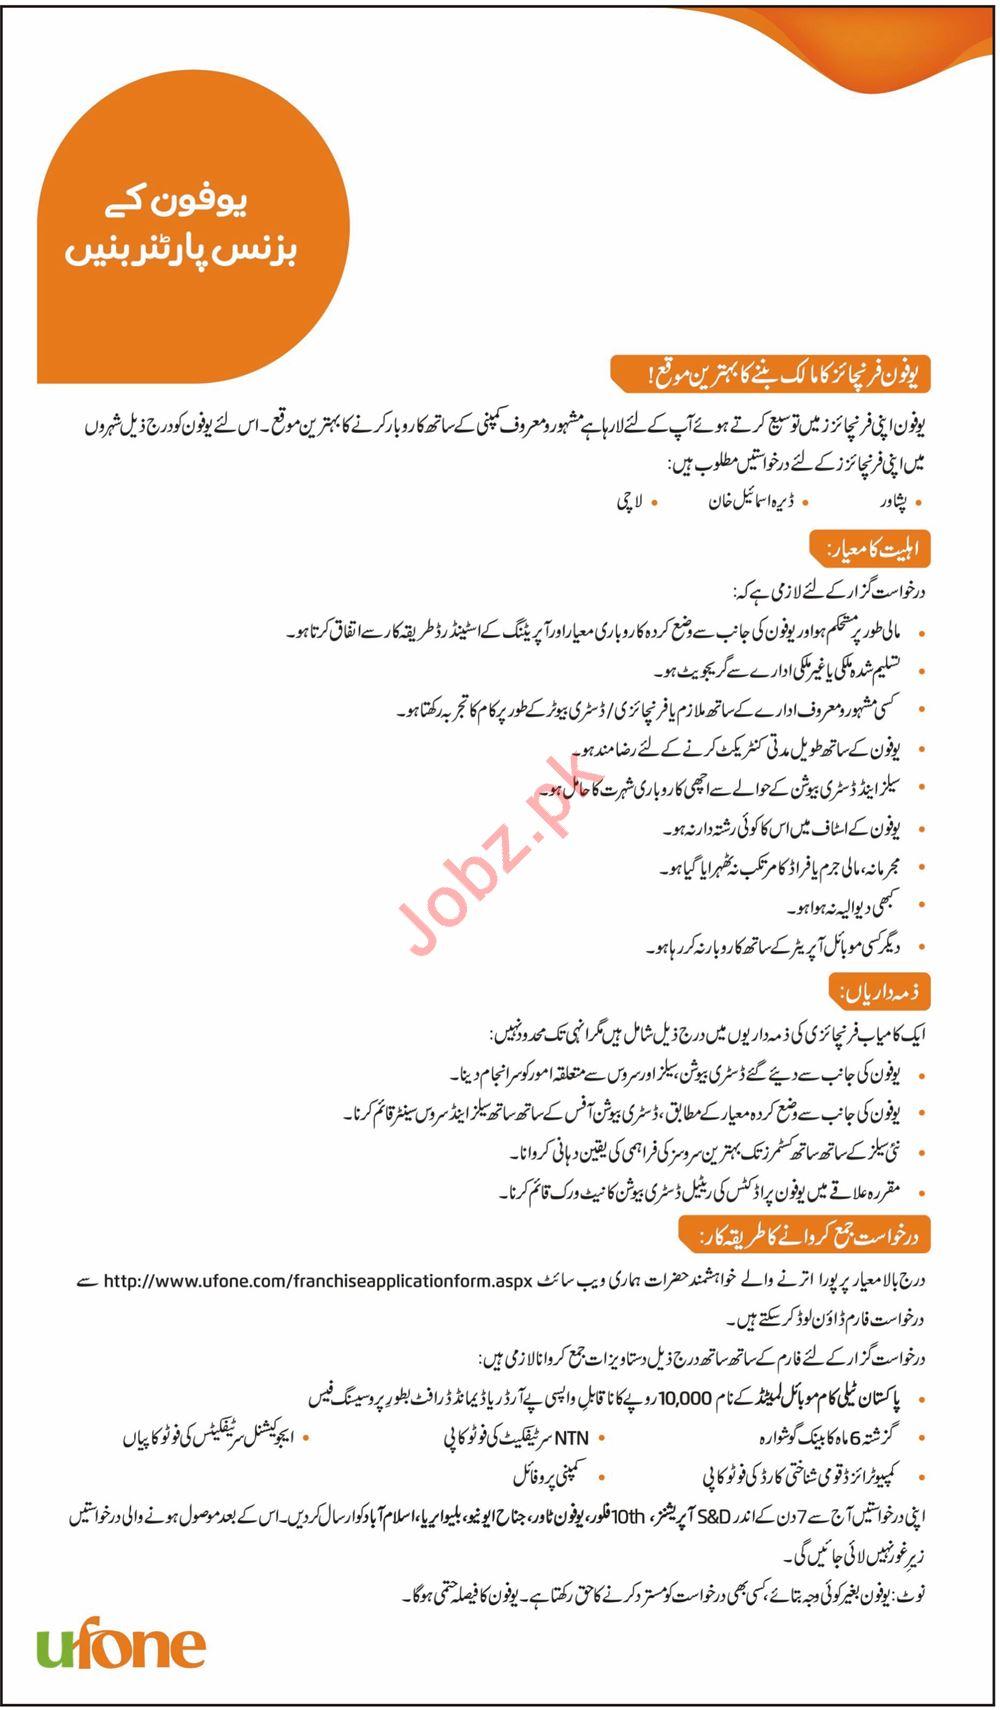 Ufone Franchises Jobs In Peshawar, DI Khan & Lachi Kohat